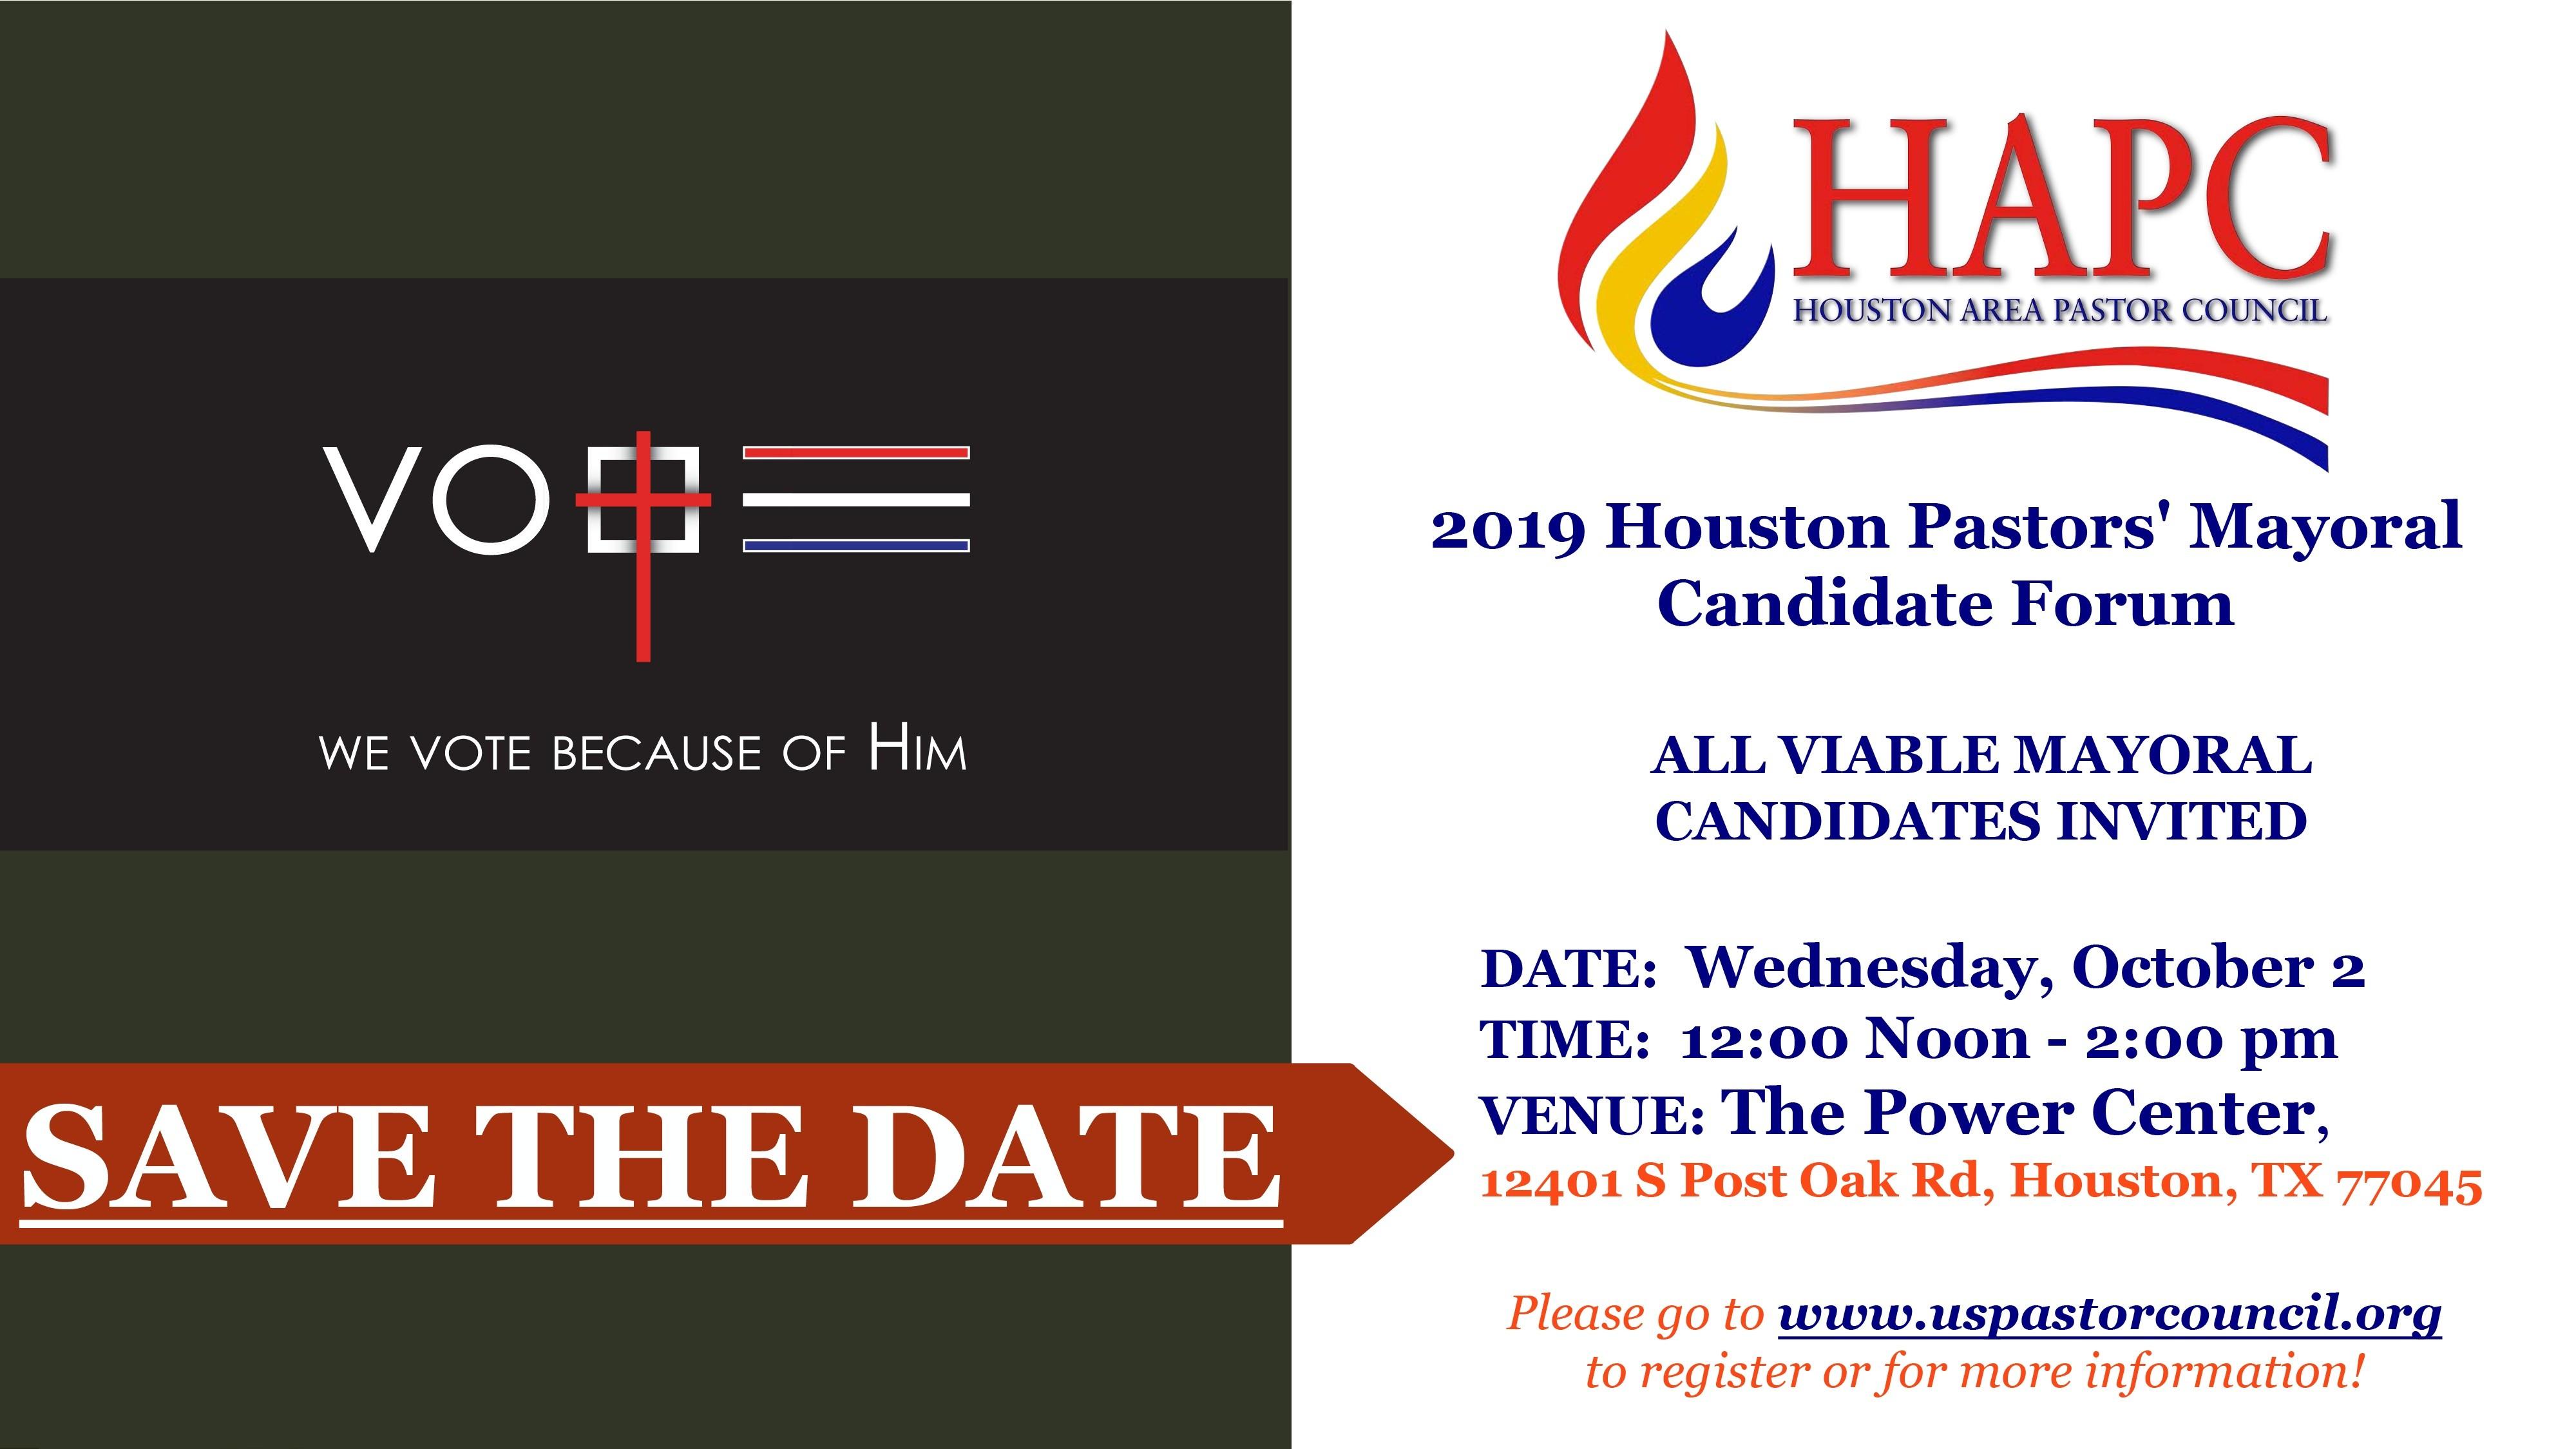 Houston Pastors' Mayoral Candidate Forum